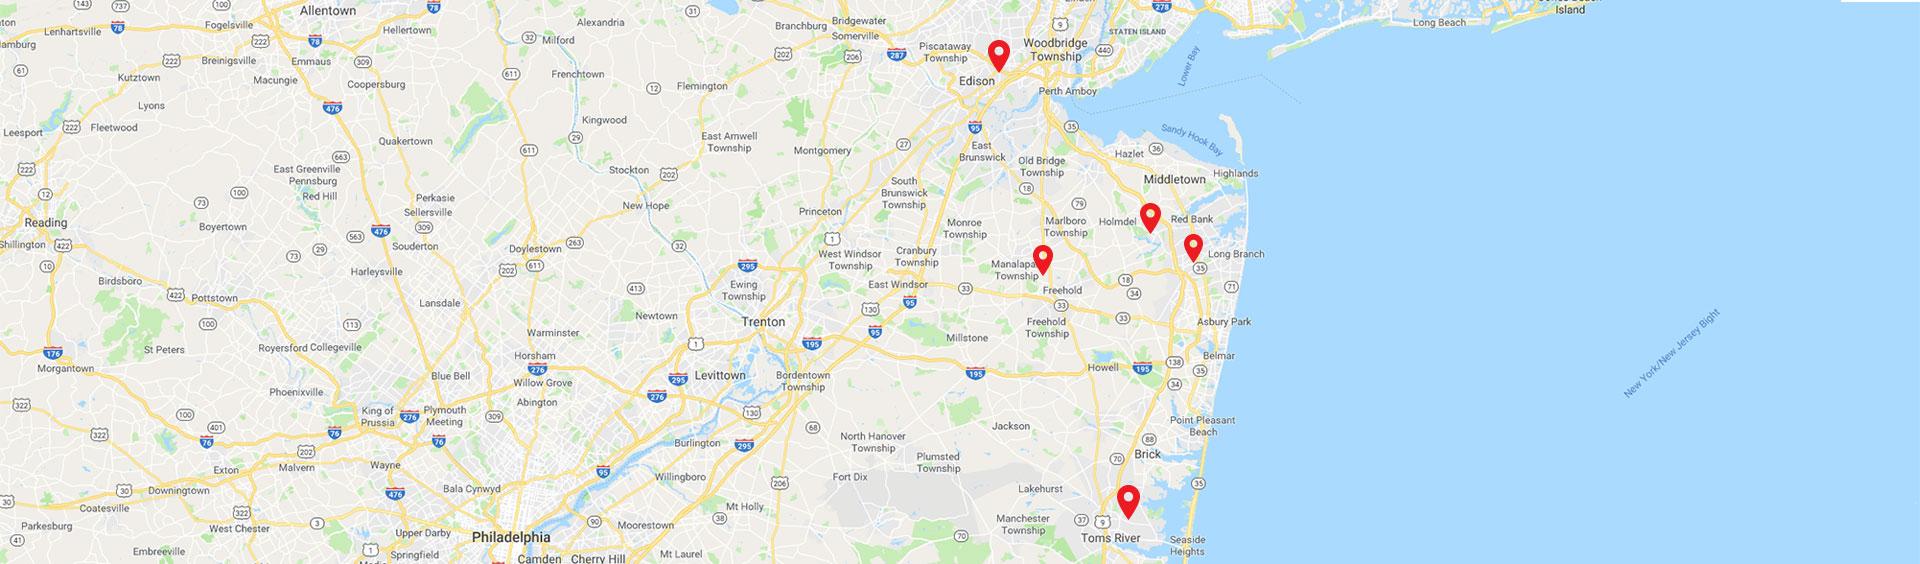 Builders' General Map Locations